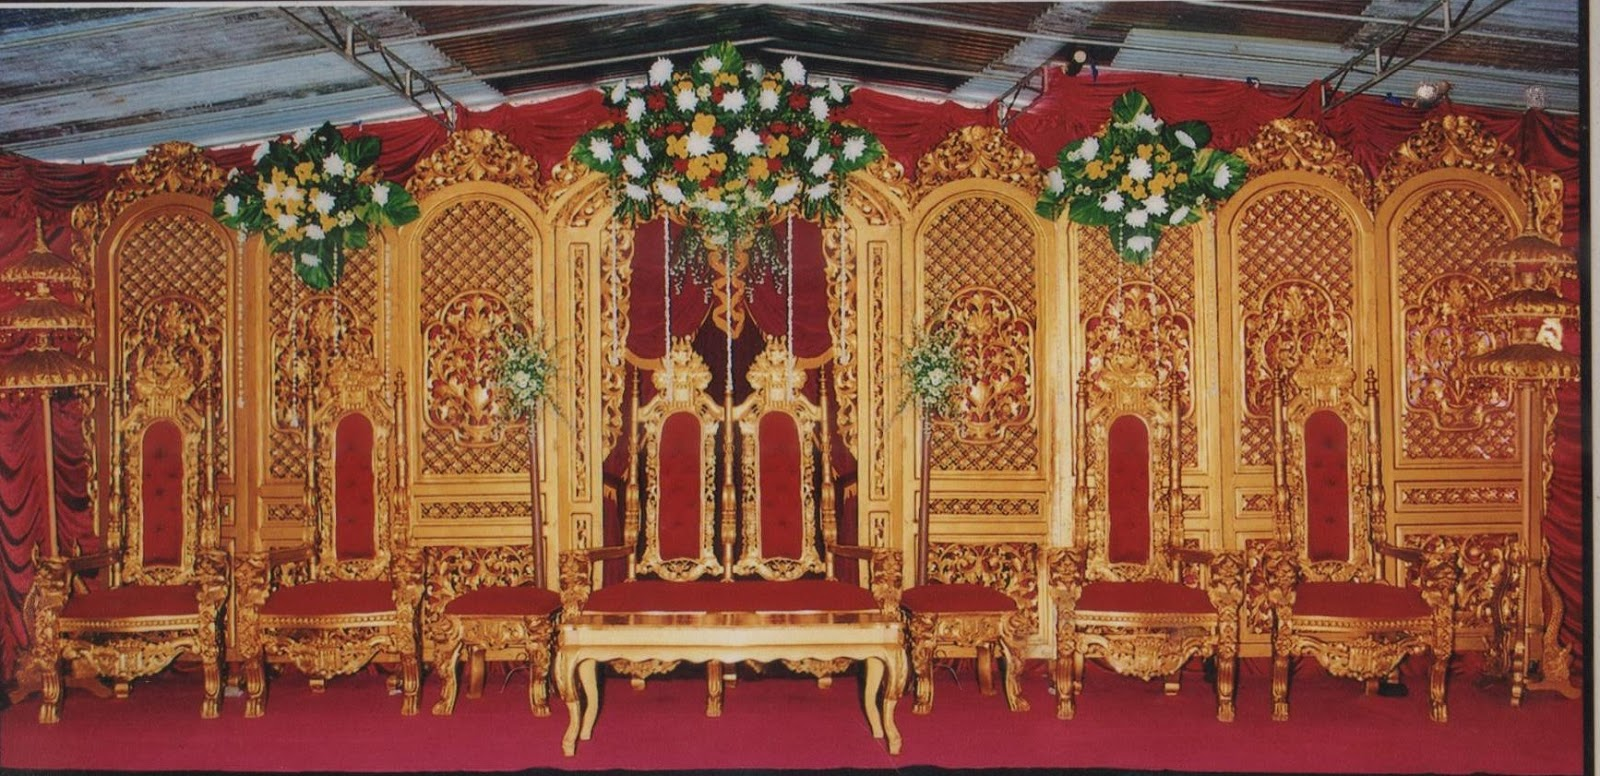 dekorasi klasik emas warna kunig emas kursi busa merah karpet tiga ...